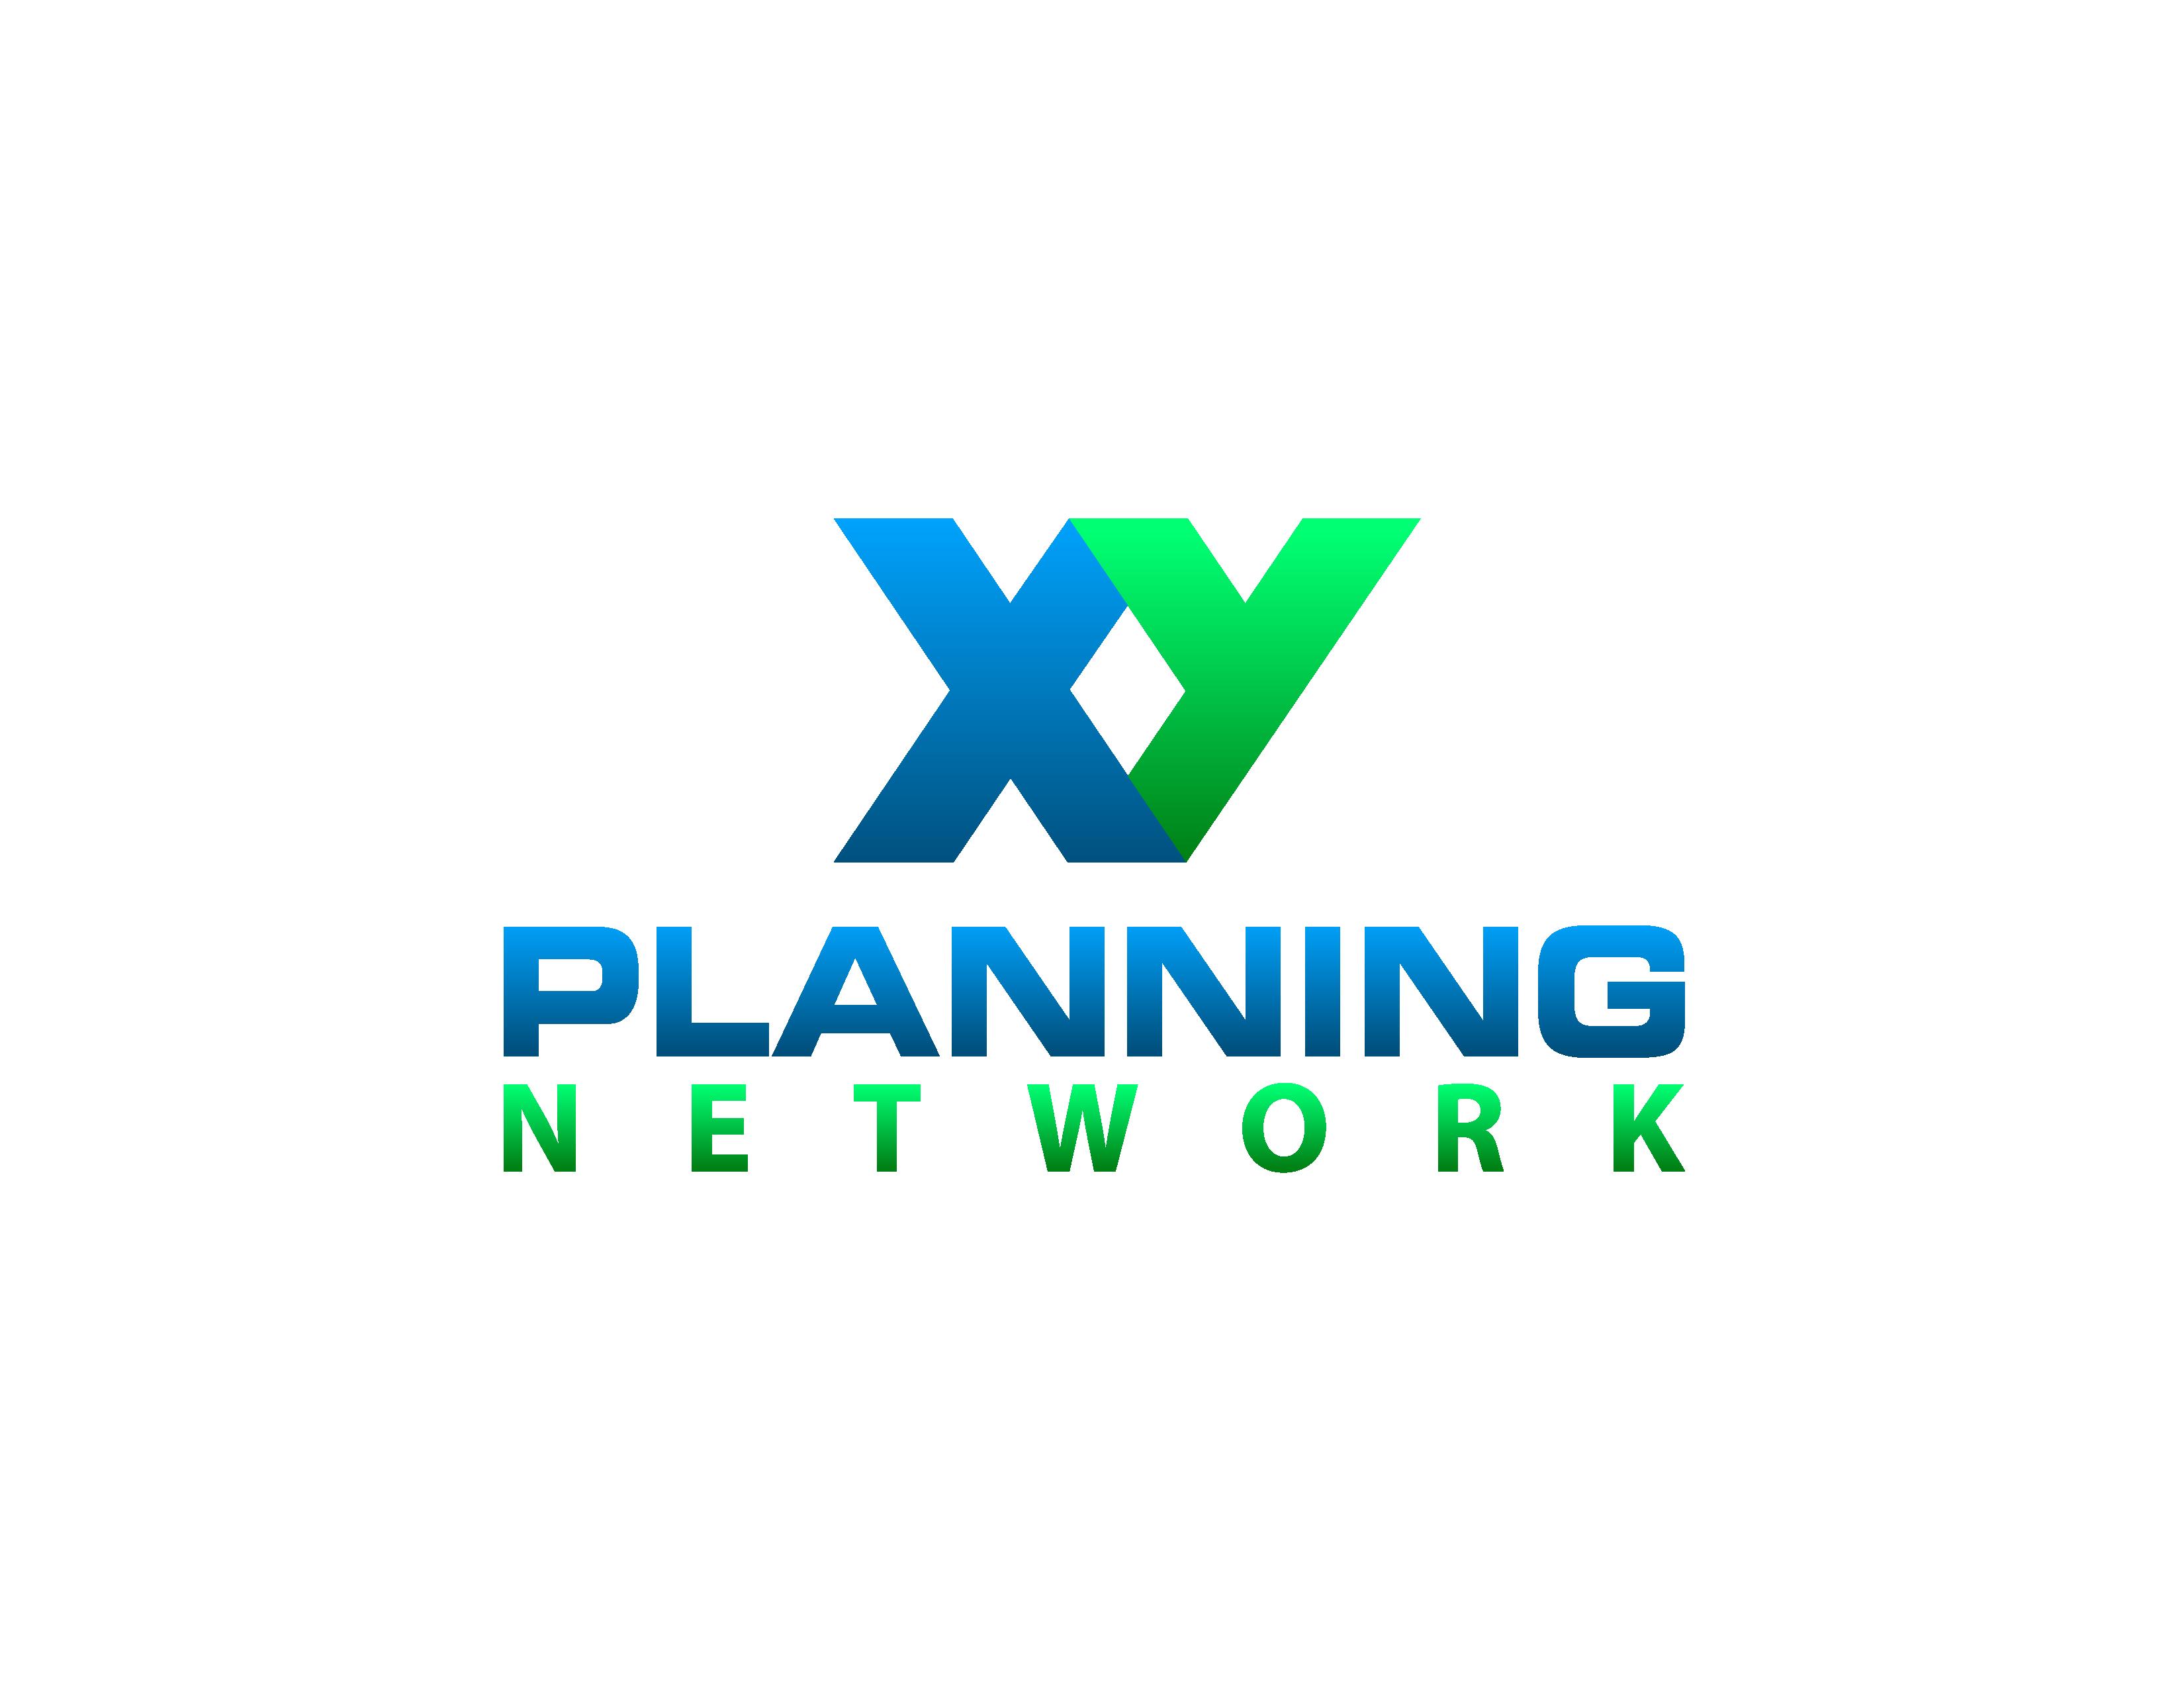 XY Planning Network logo White Plains, NY True Abundance Advisors